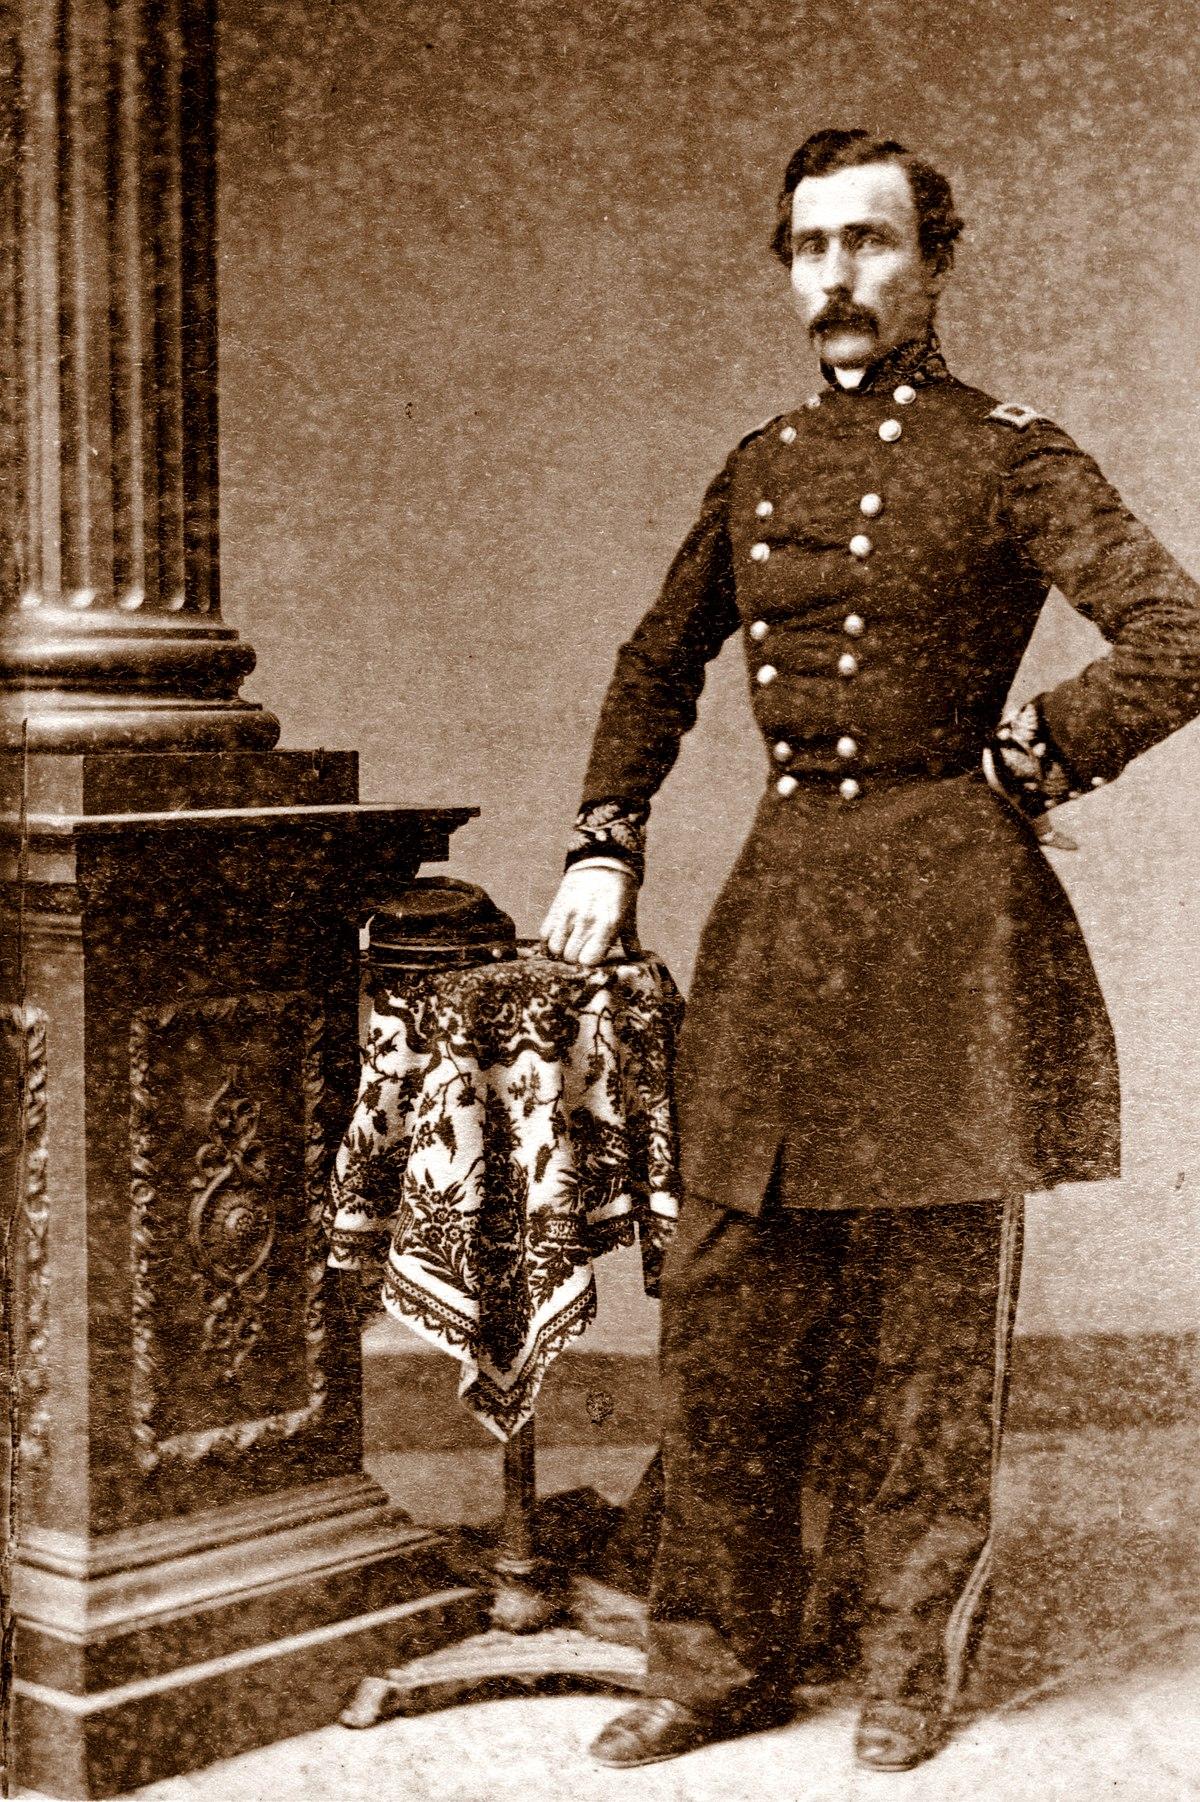 Daniel M. Frost - Wikipedia